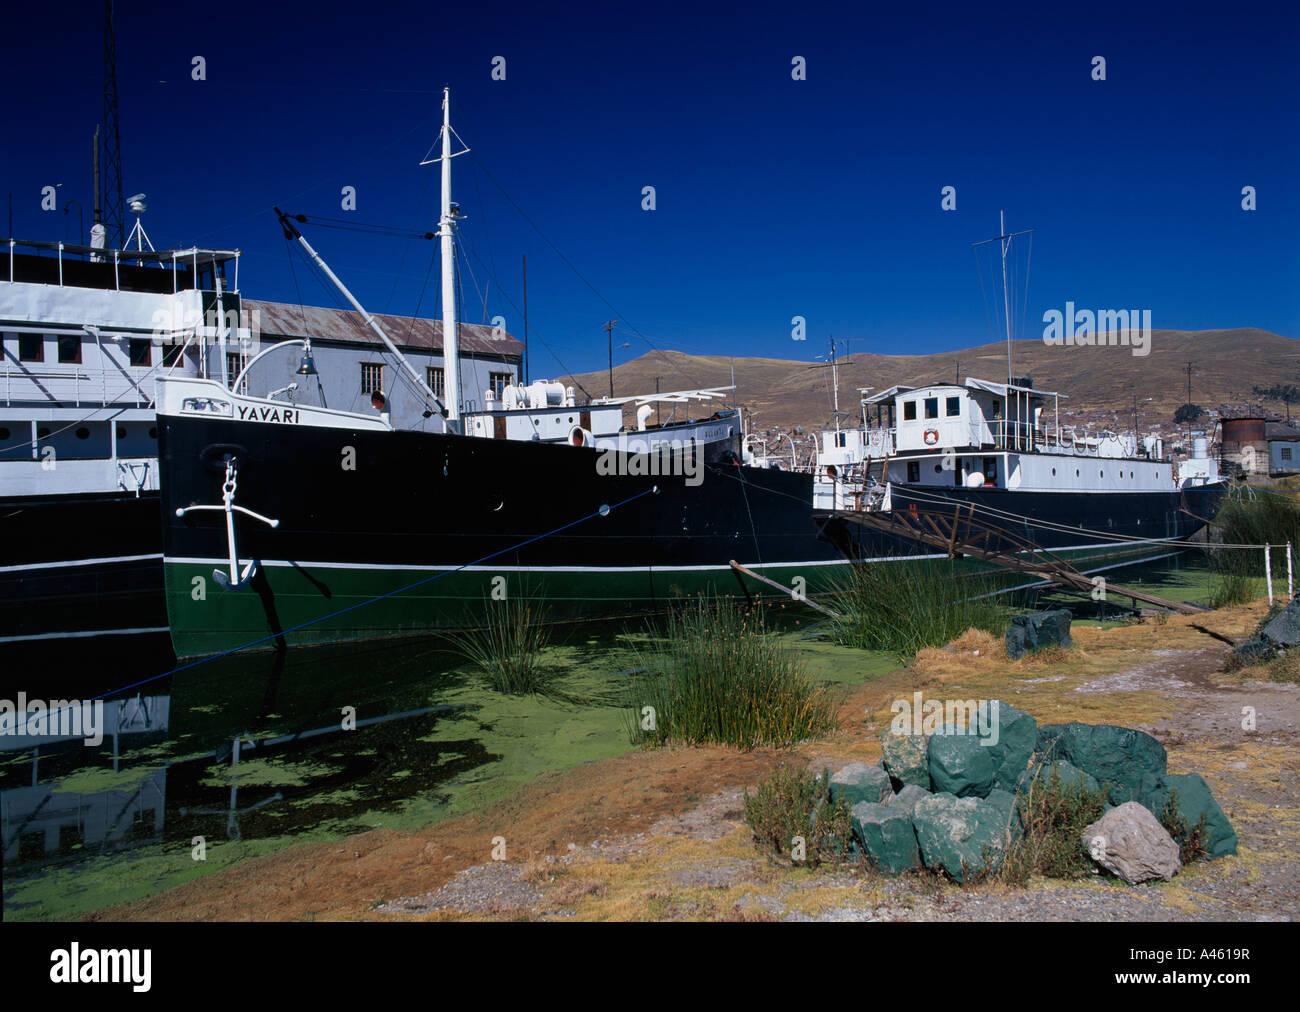 PERU South America Puno Administrative Division Puno Lake Titicaca Yavari the oldest ship on Lake Titicaca moored - Stock Image